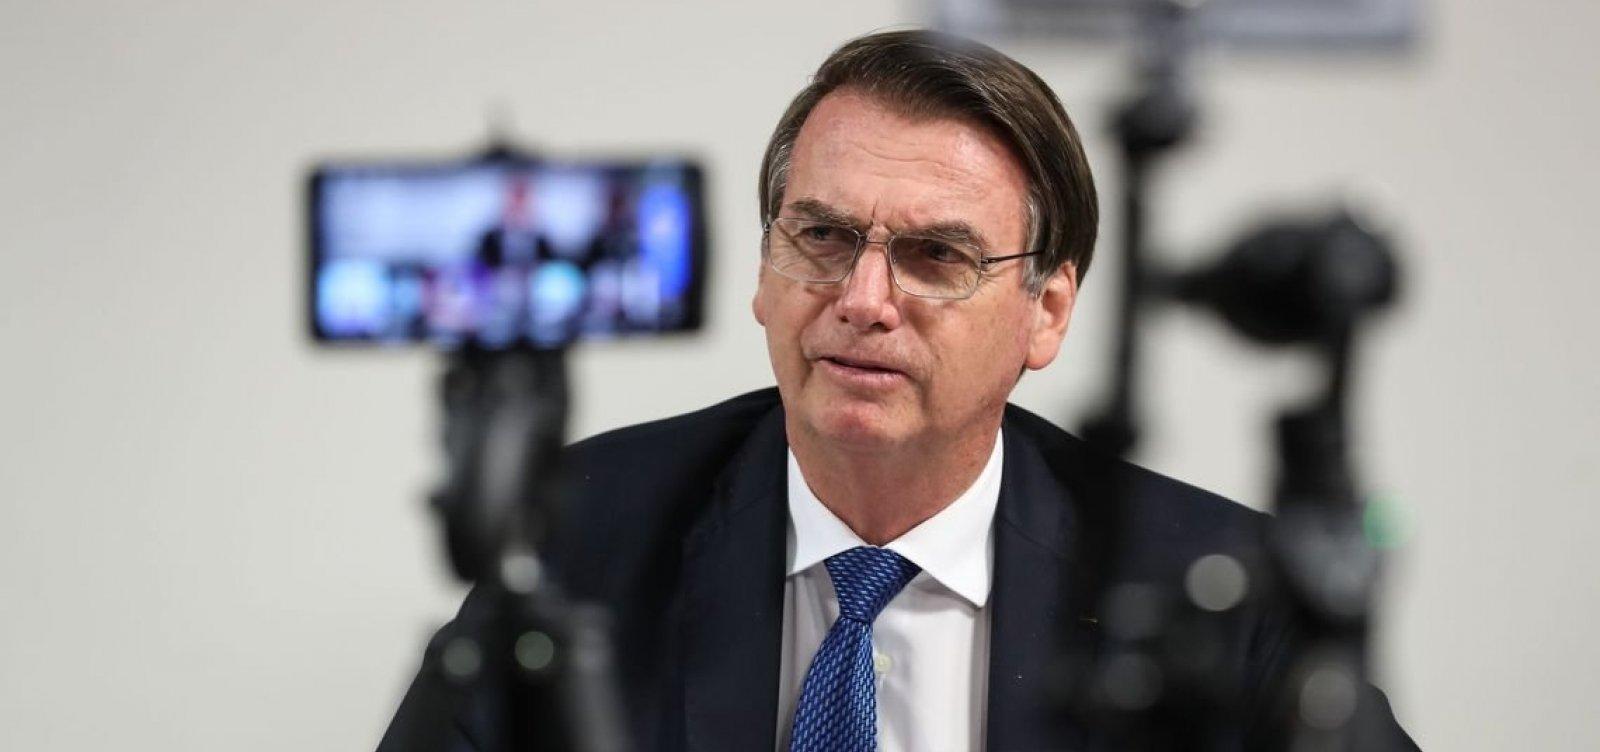 Bolsonaro confirma visita a países árabes no início do segundo semestre